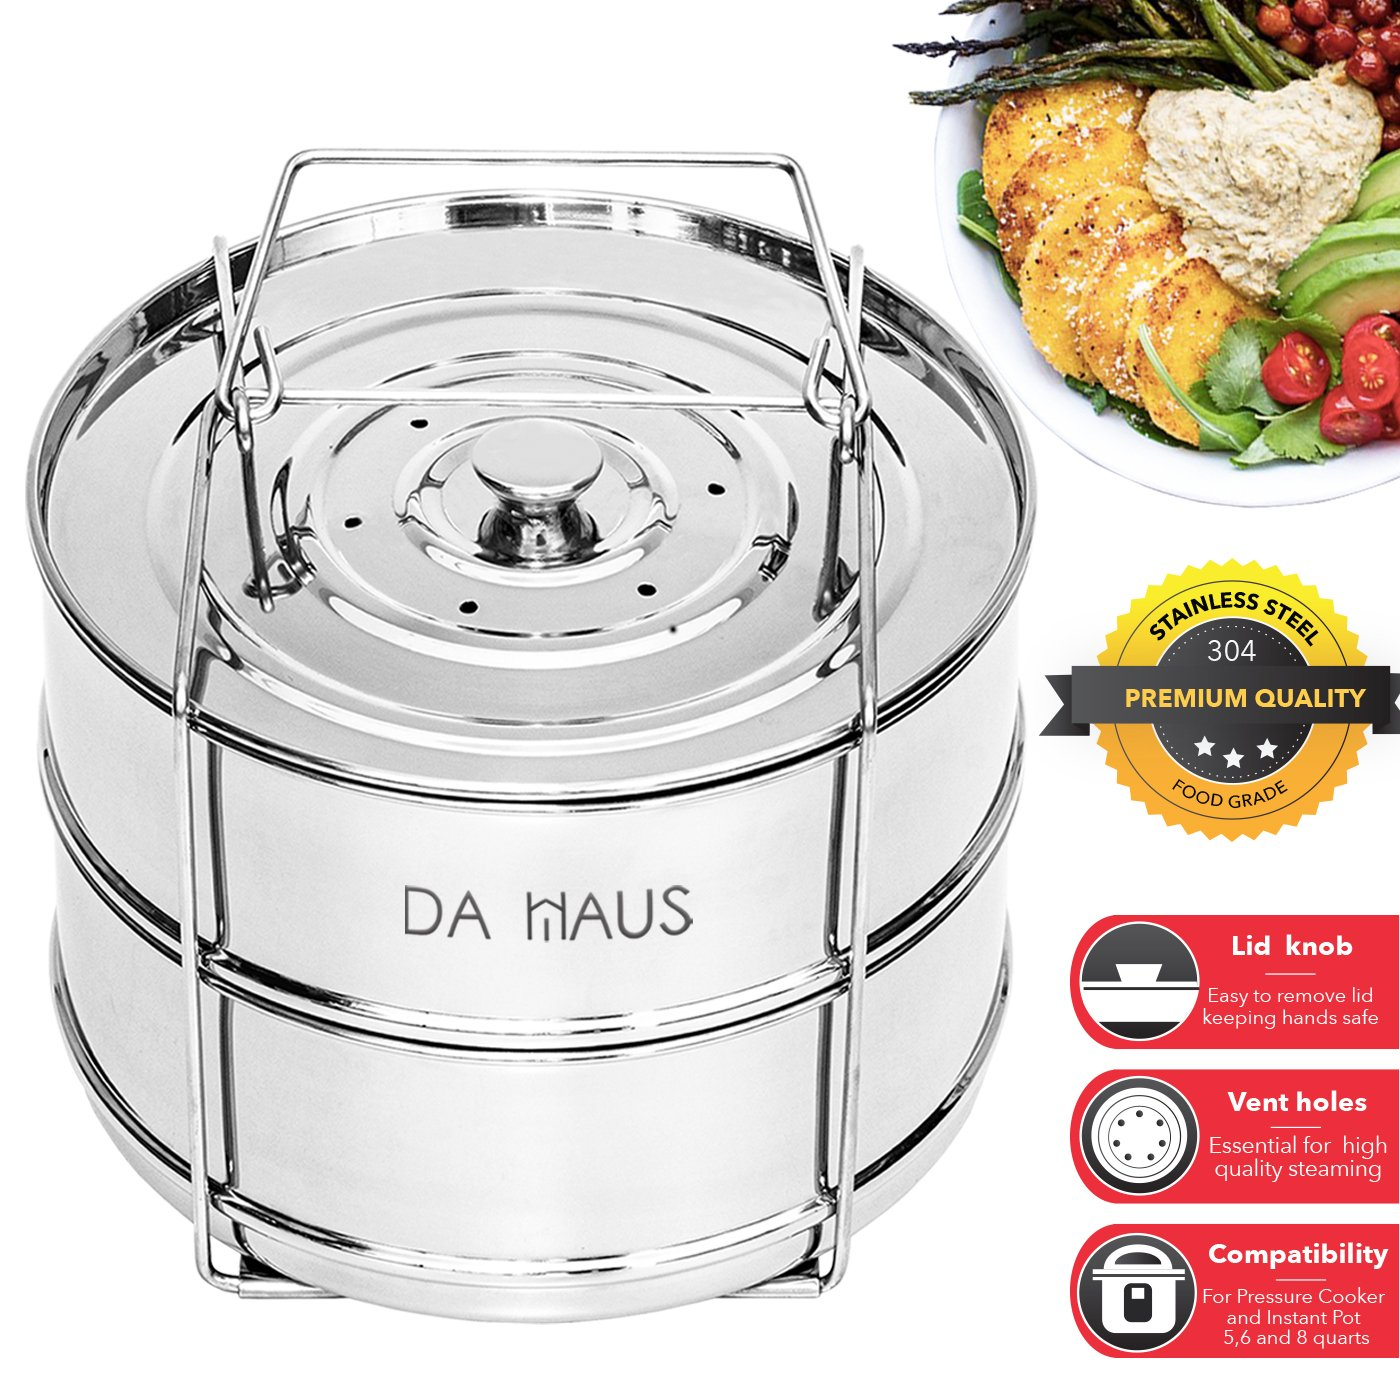 Da Haus Stackable Steamer Insert Pans - Instant Pot Insert 6 qt, 8 qt and 5 qt Insert Pans for Pressure Cooker. Instant Pot Stackable Pans S1